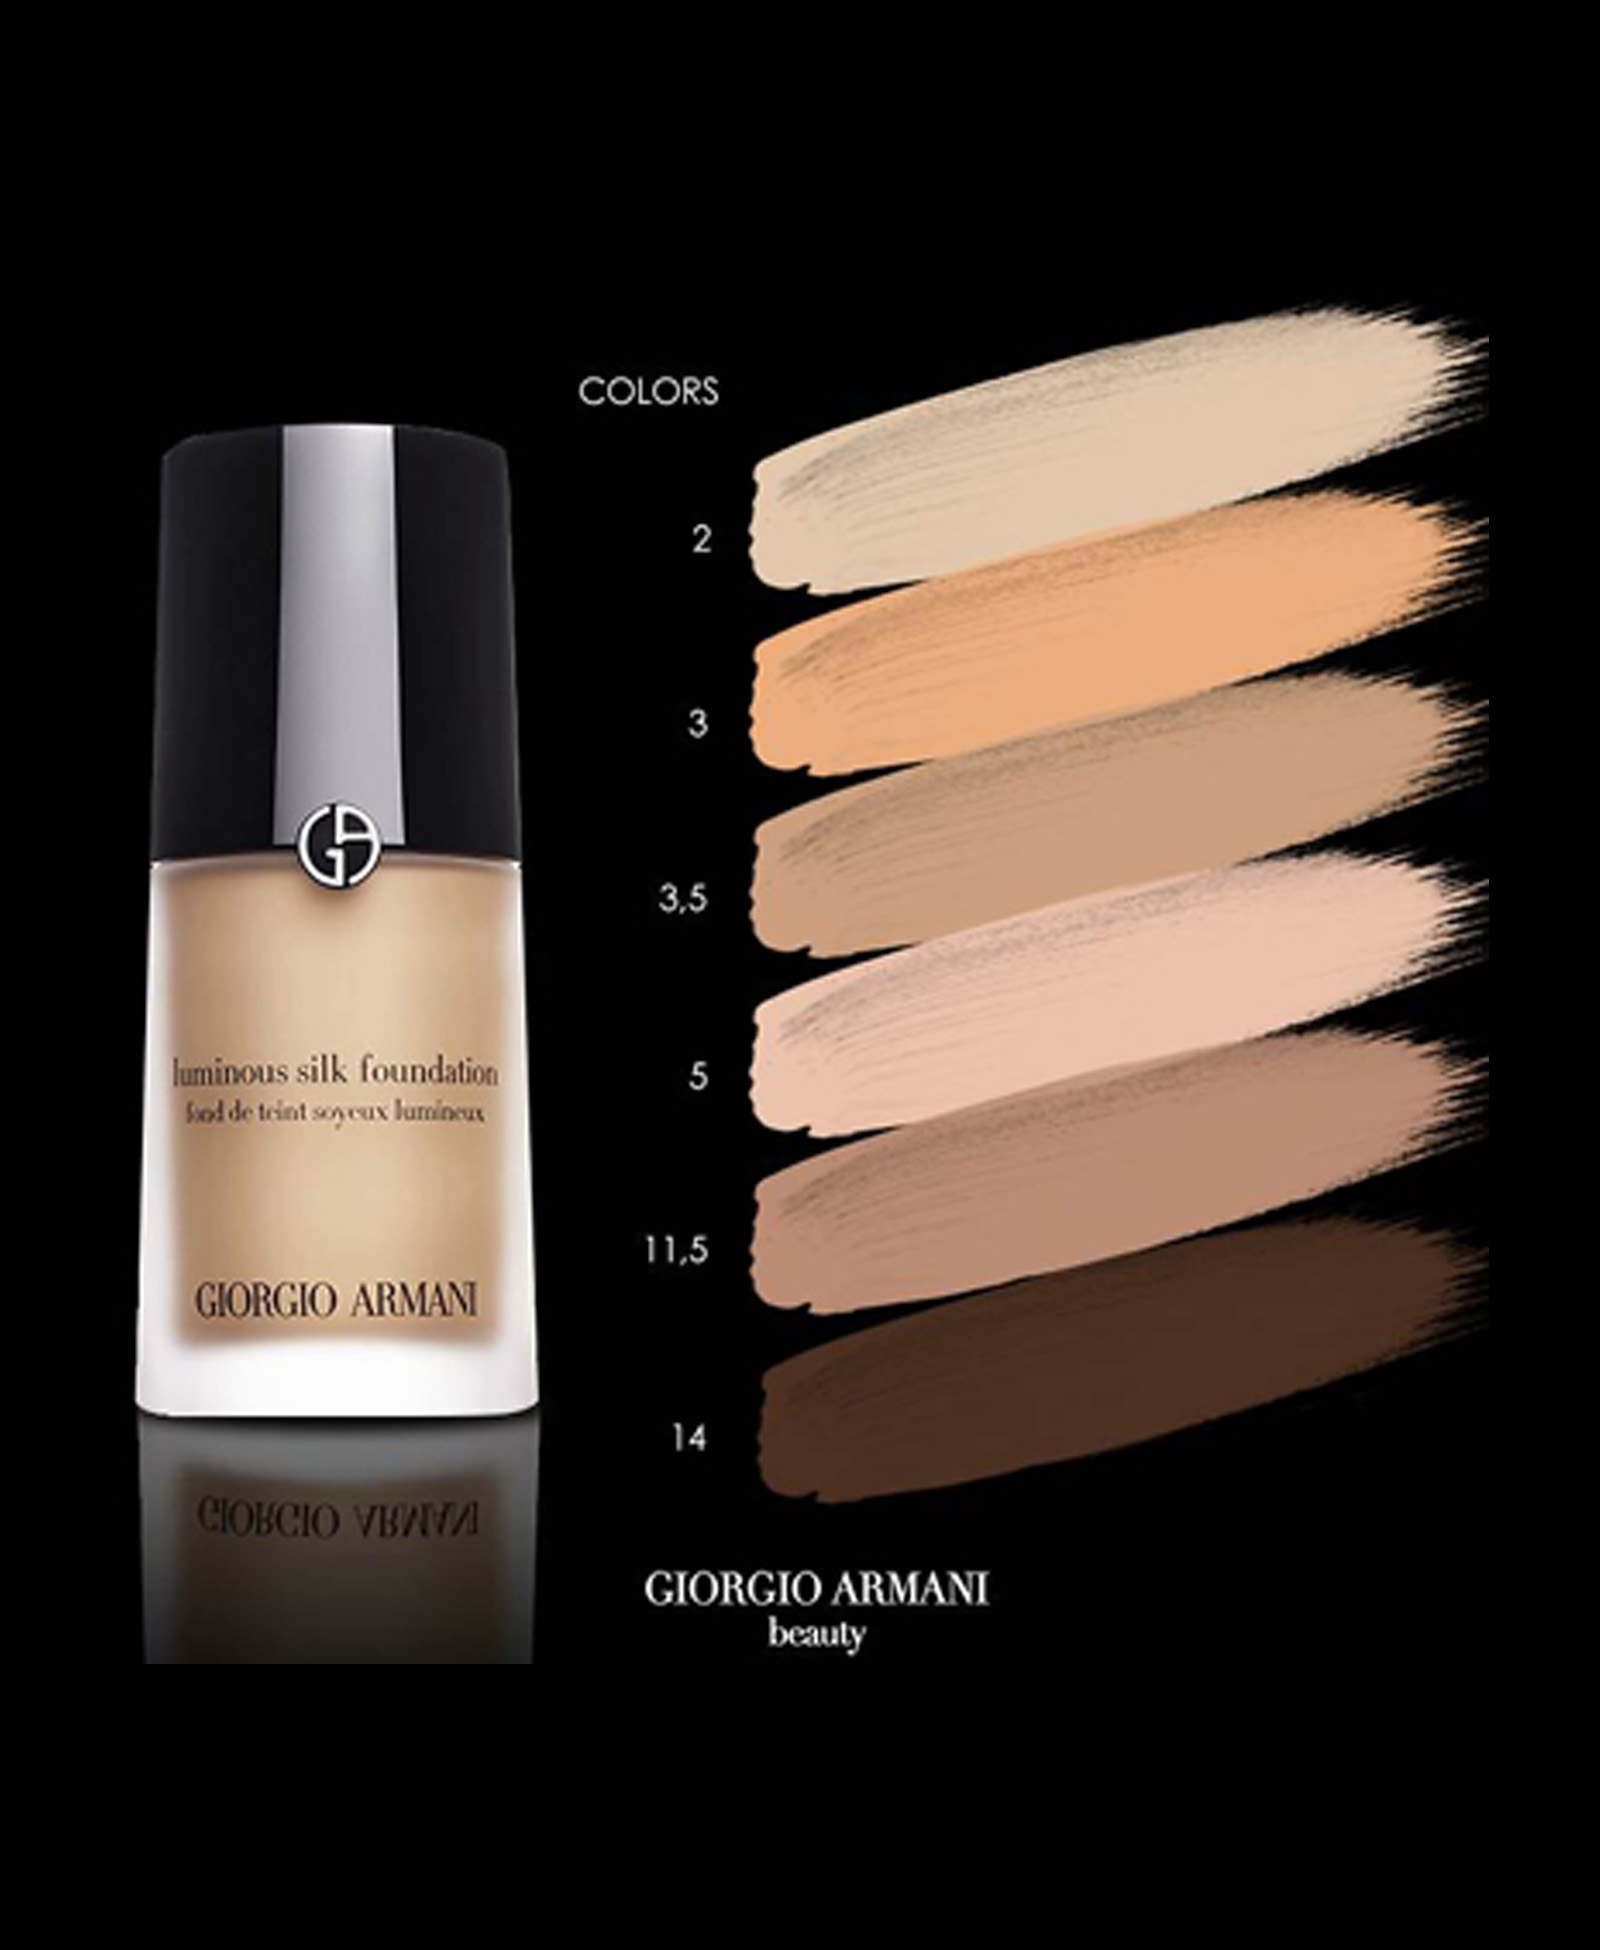 Giorgio Armani Makeup Foundation Reviews | Saubhaya Makeup